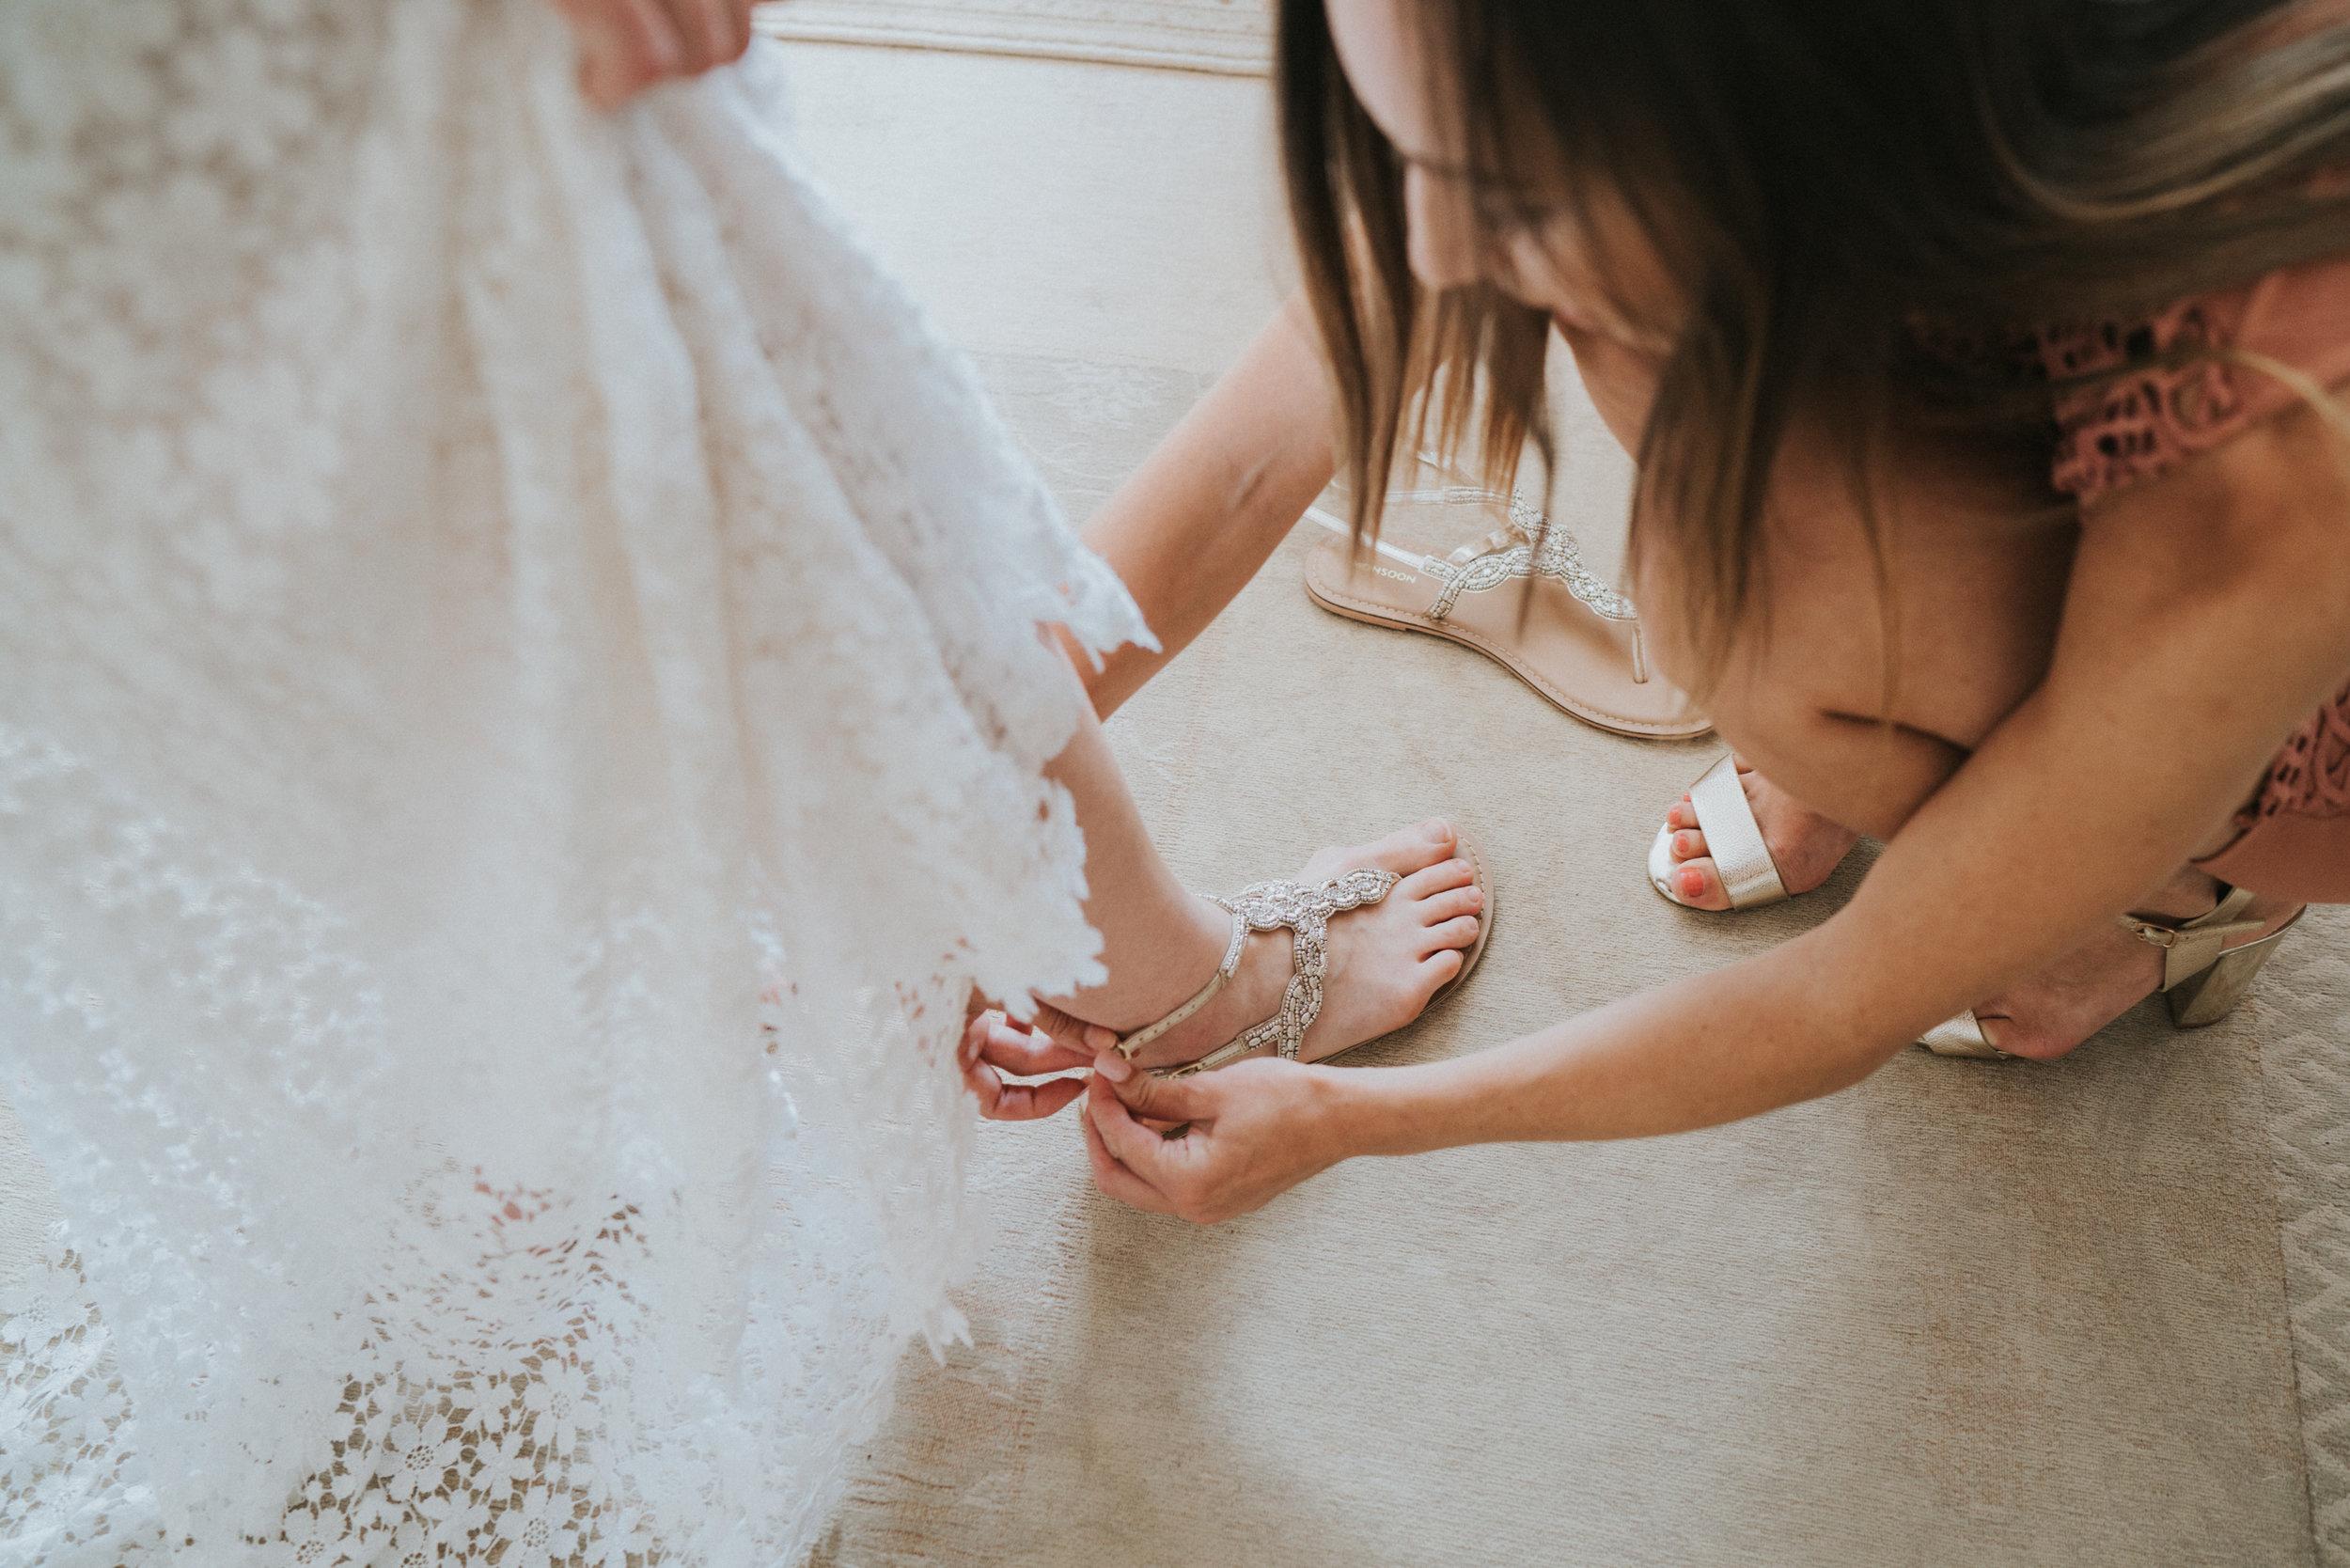 Grace-Elizabeth-Georgie-Amalaketu-Firstsite-Colchester-Essex-Boho-Buddhist-Wedding-Alternative-Wedding-Photography-Essex (31 of 100).jpg